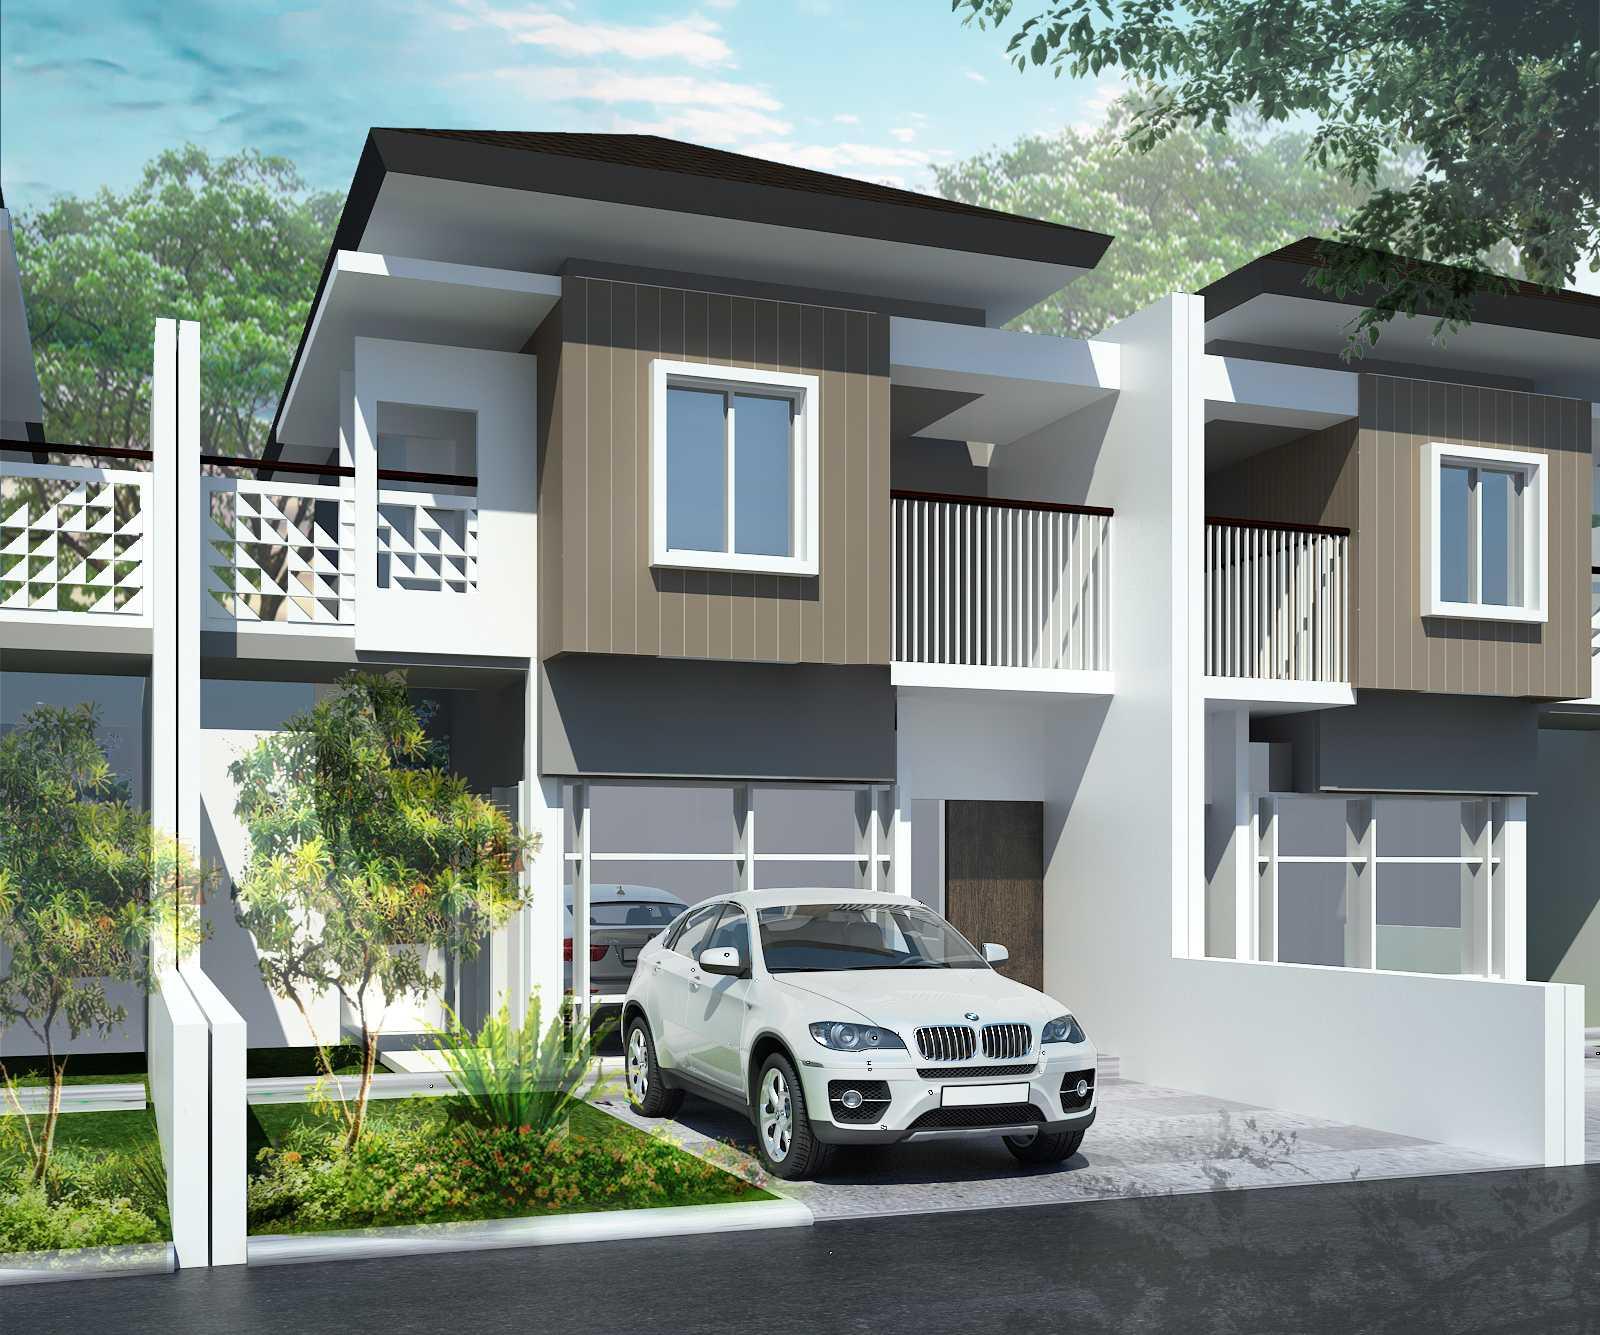 Pt Alradista Desain Indonesia Garden City Bandung Bandung Bandung Front View Modern  12920